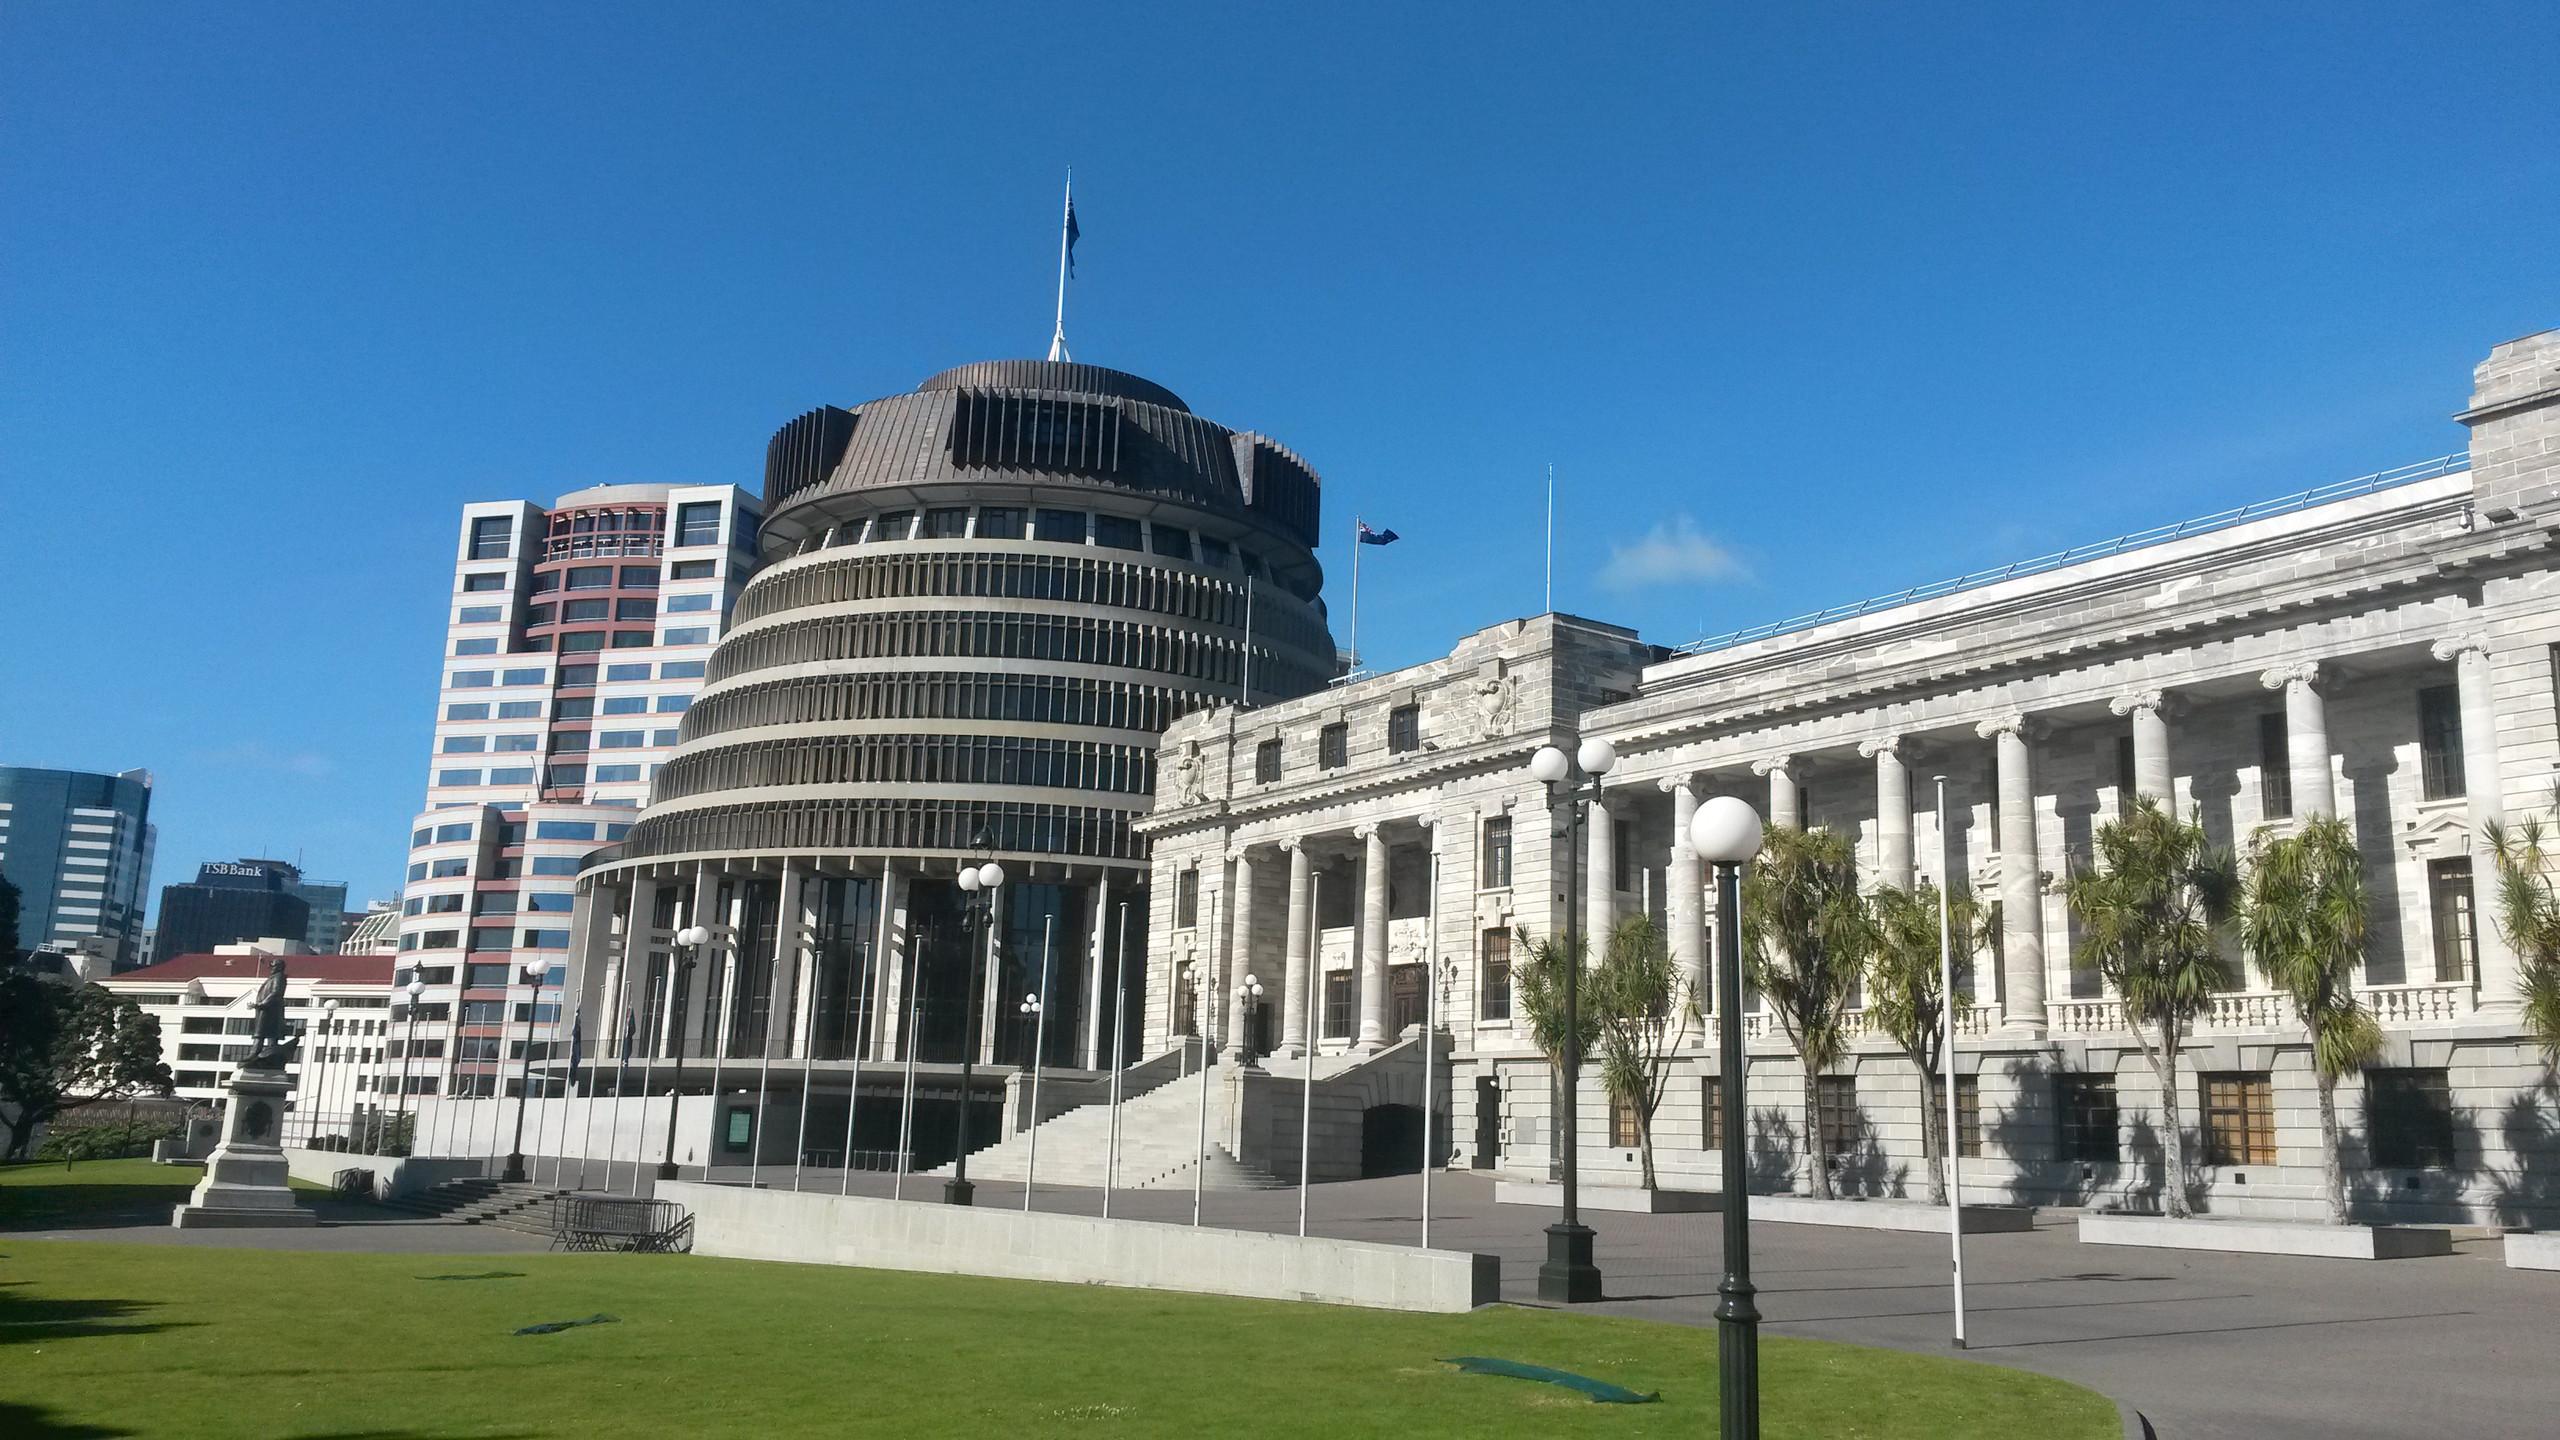 Parliament building (Beehive) Wellington New Zealand